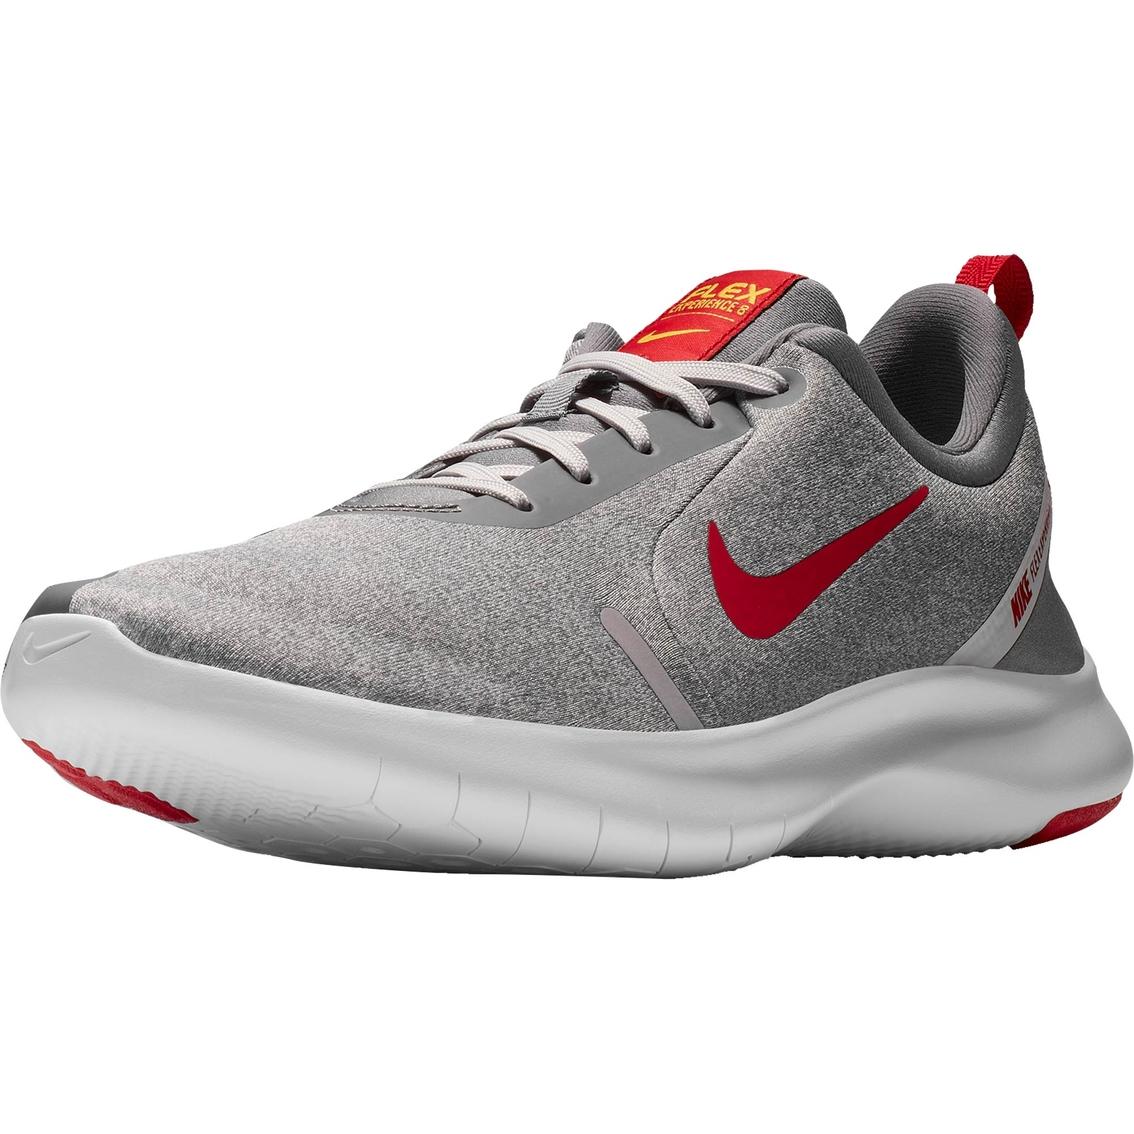 Nike Men's Flex Experience Rn 8 Running Shoes | Running